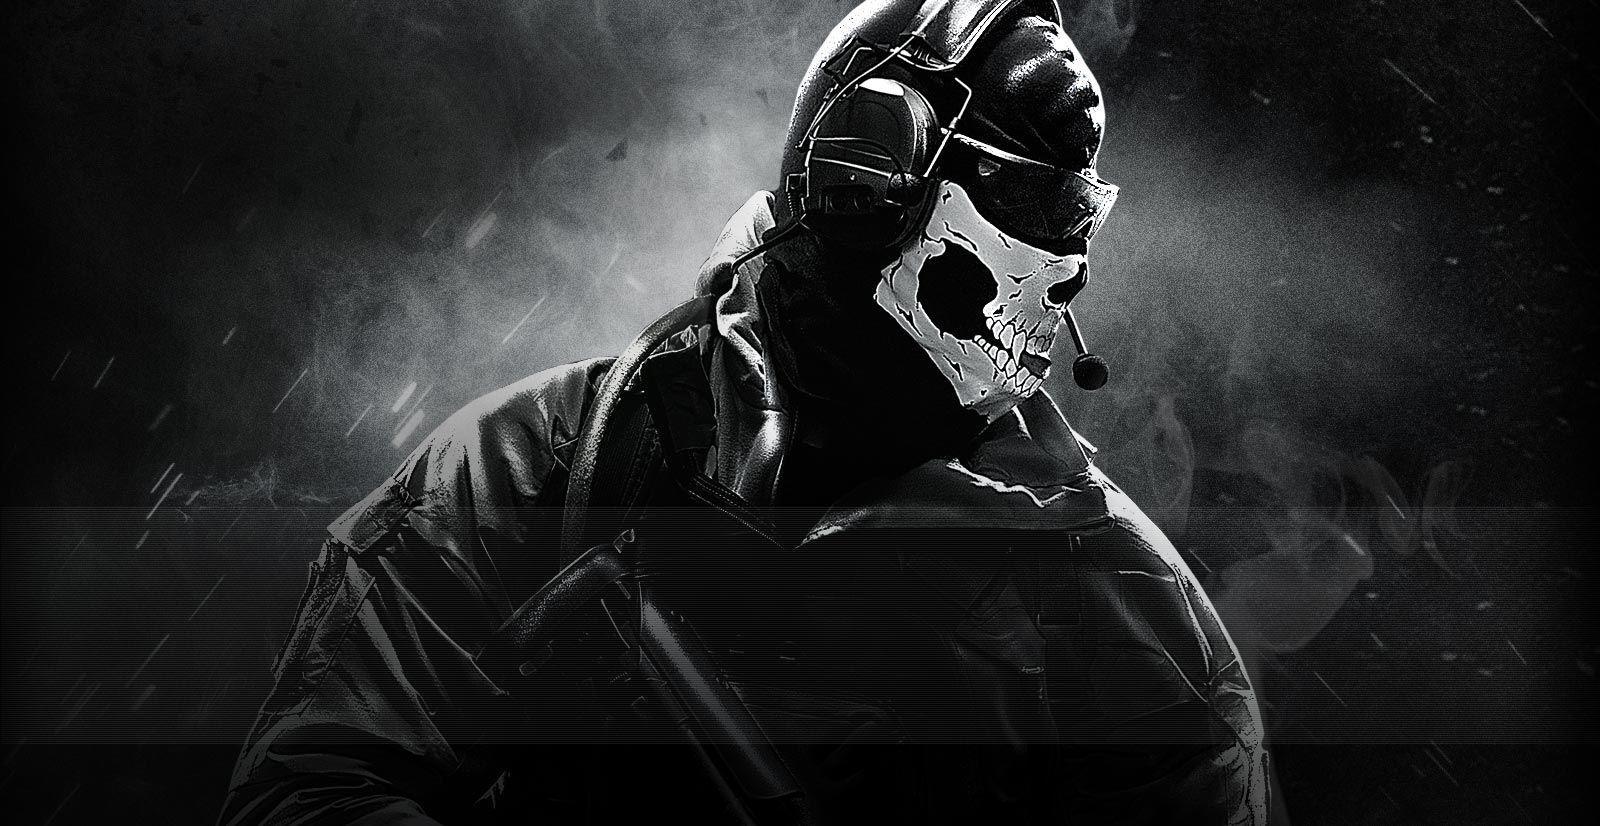 Image Ghost Wallpaper Image Codo Jpg Call Of Duty Wiki Fandom